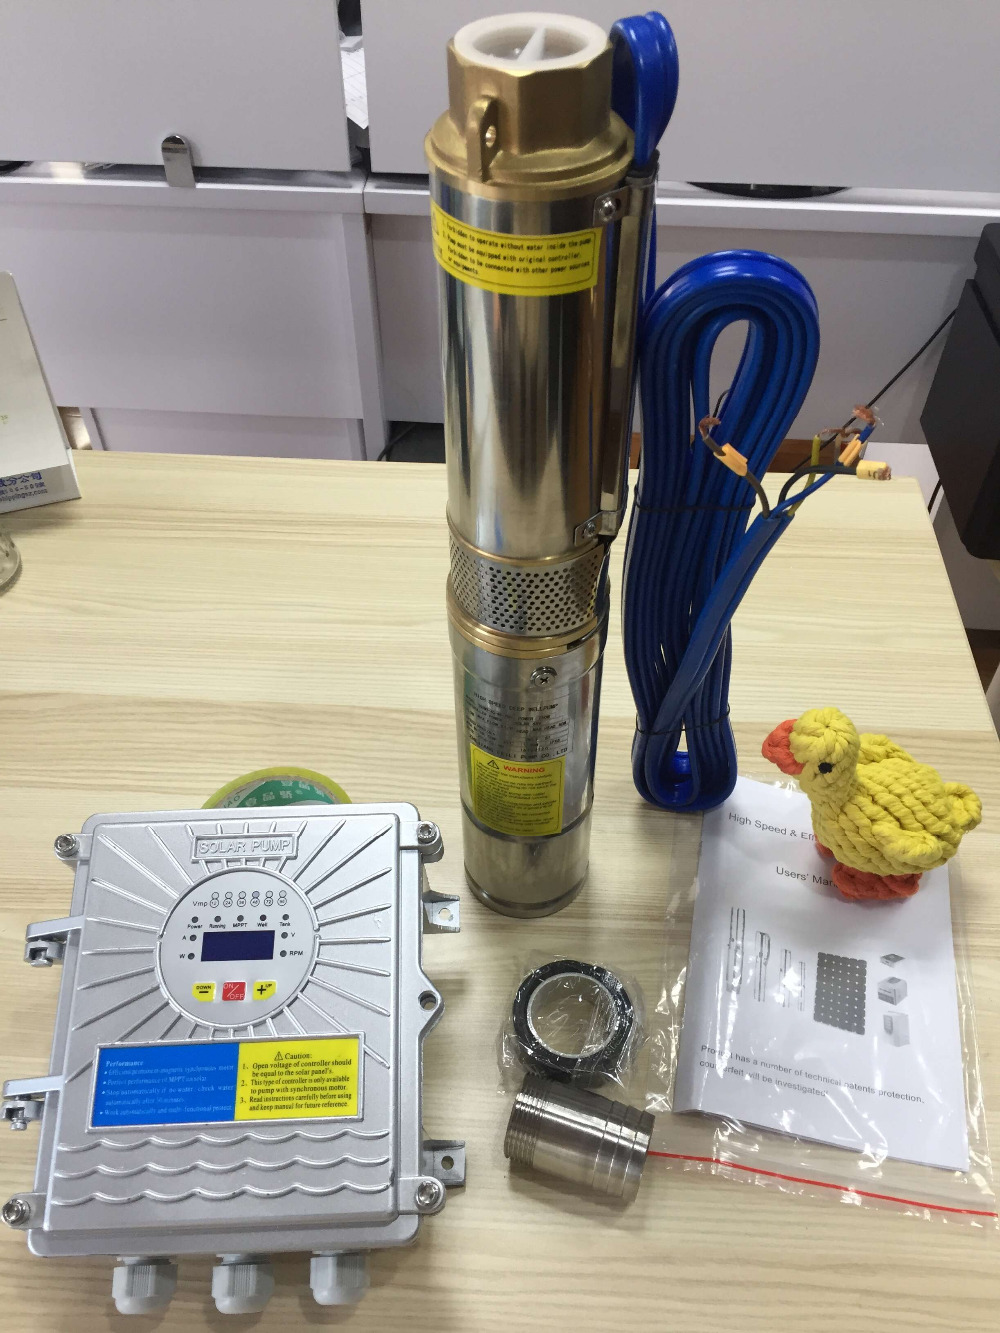 factory price solar brushless pump made in china 2 years warranty solar borehole pump удлинитель ударных торцевых головок kraftool 1 2 250мм 27965 250 z01